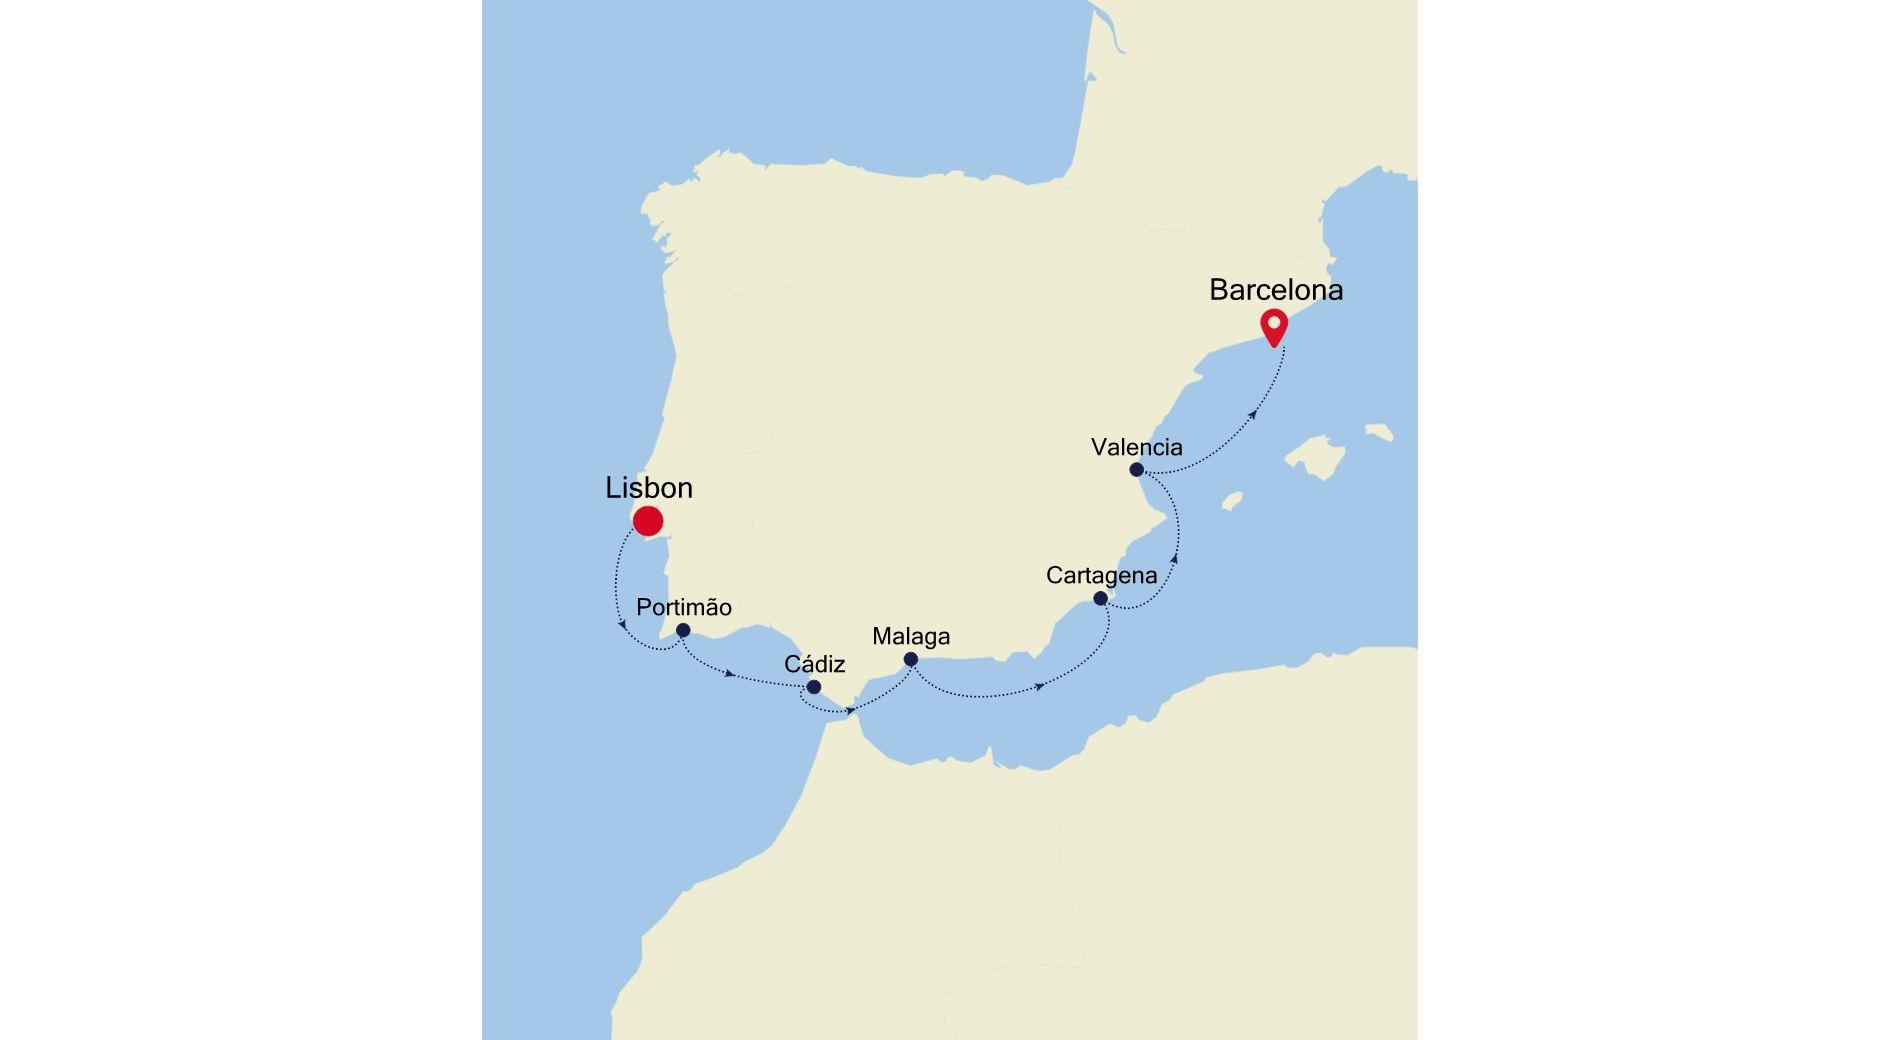 SS200409007 - Lisbon to Barcelona